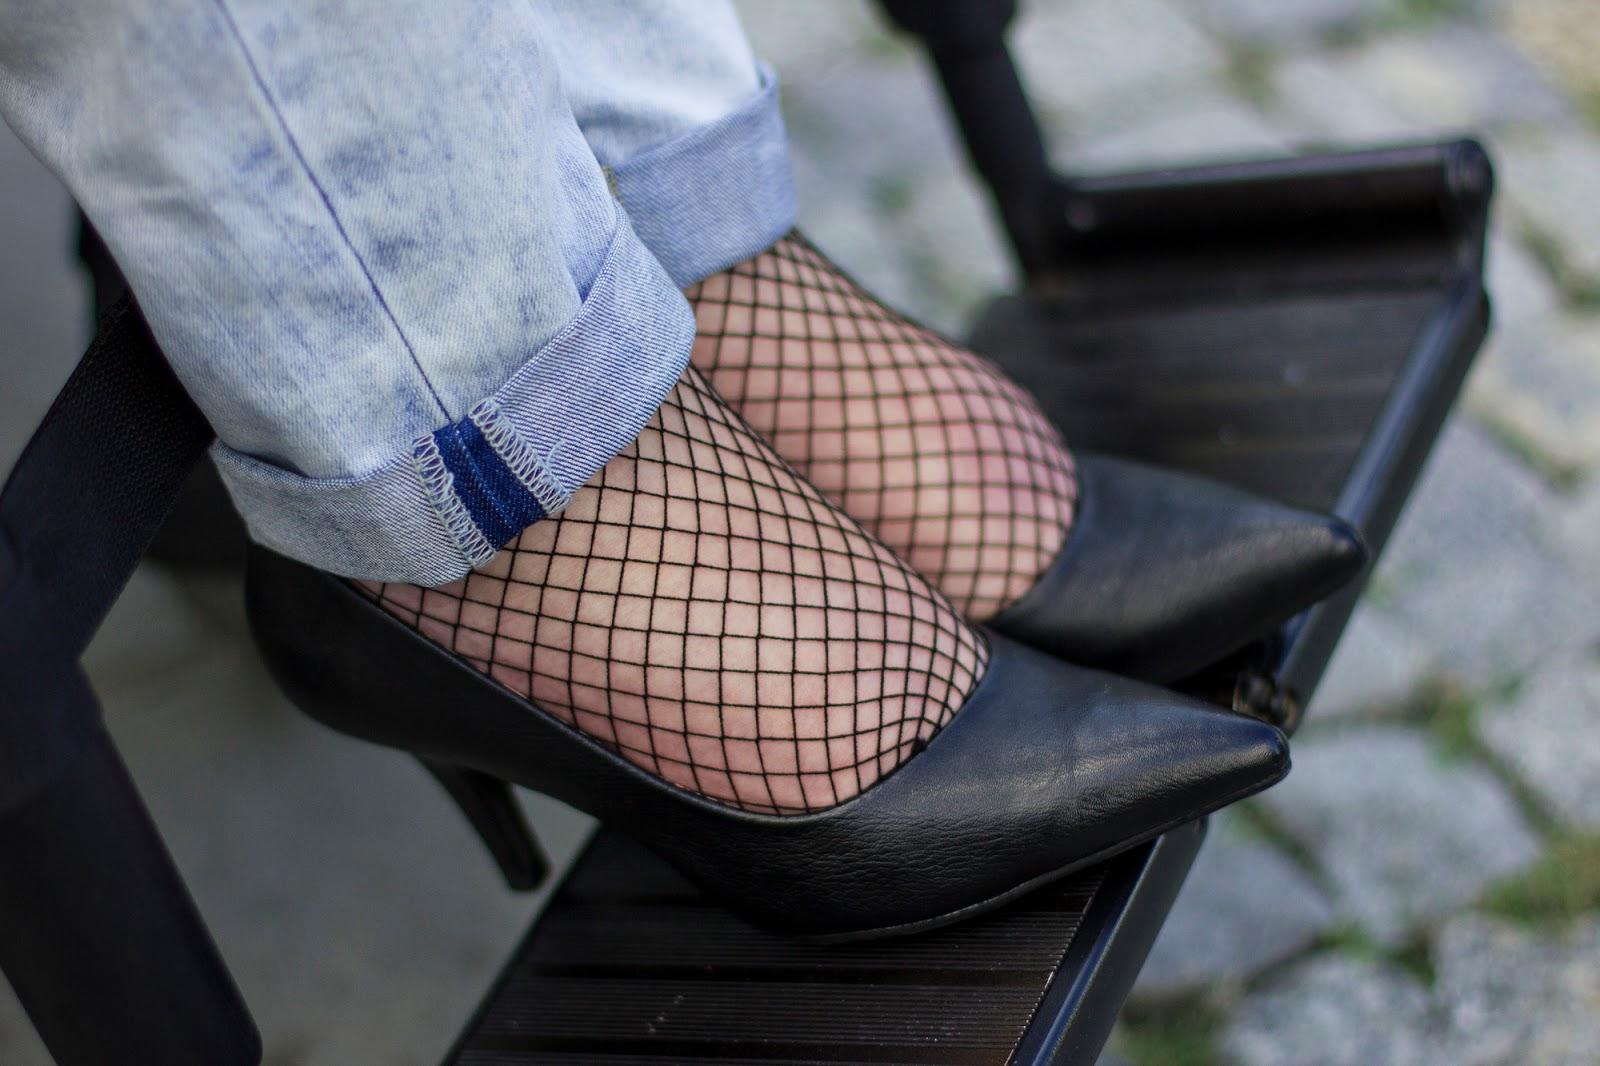 szpilki dżinsy kabaretki